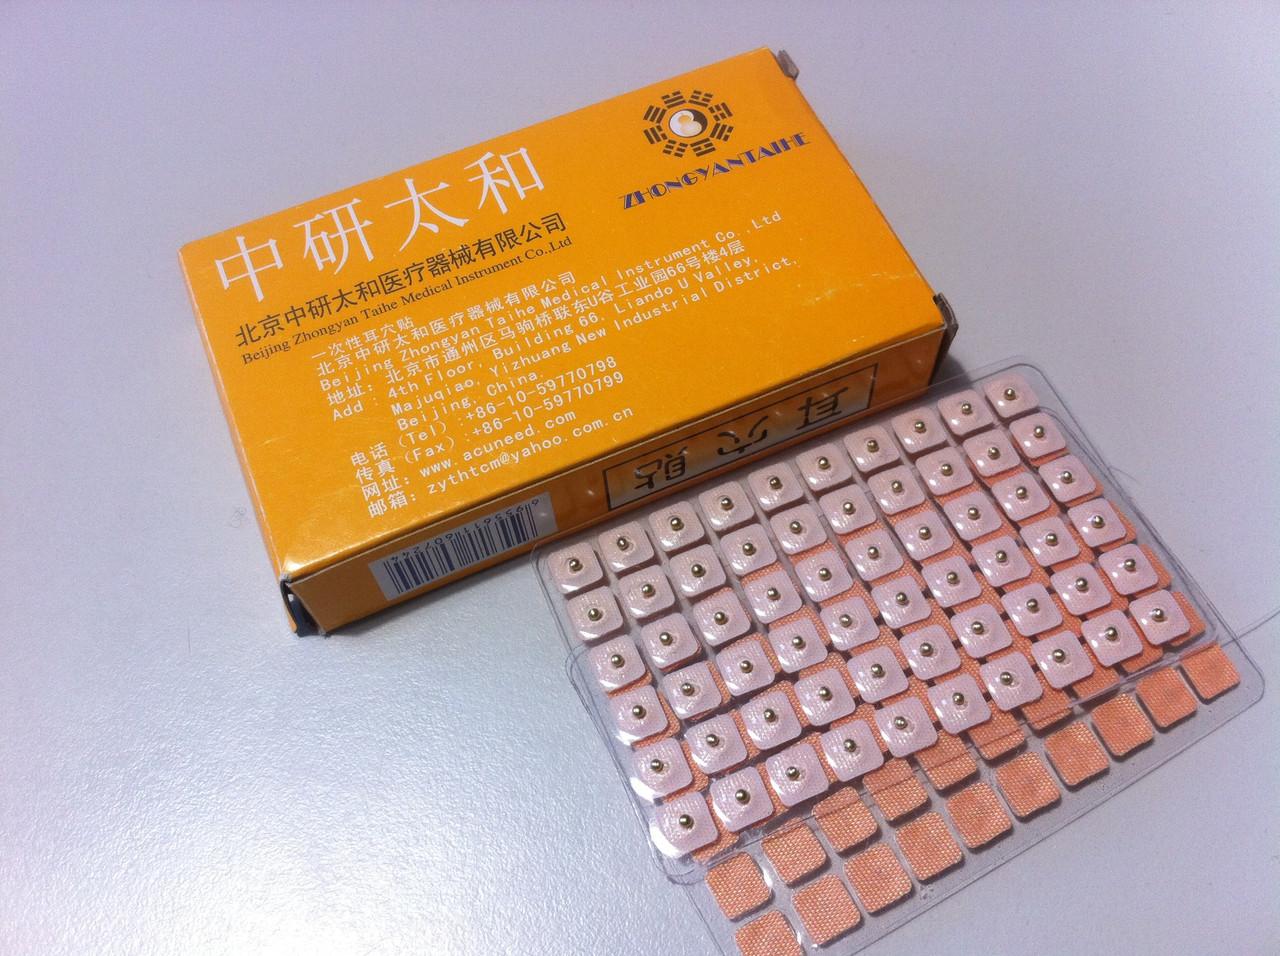 Зерна магнитные для цуботерапии  Zhongyn Taine - 600 шт